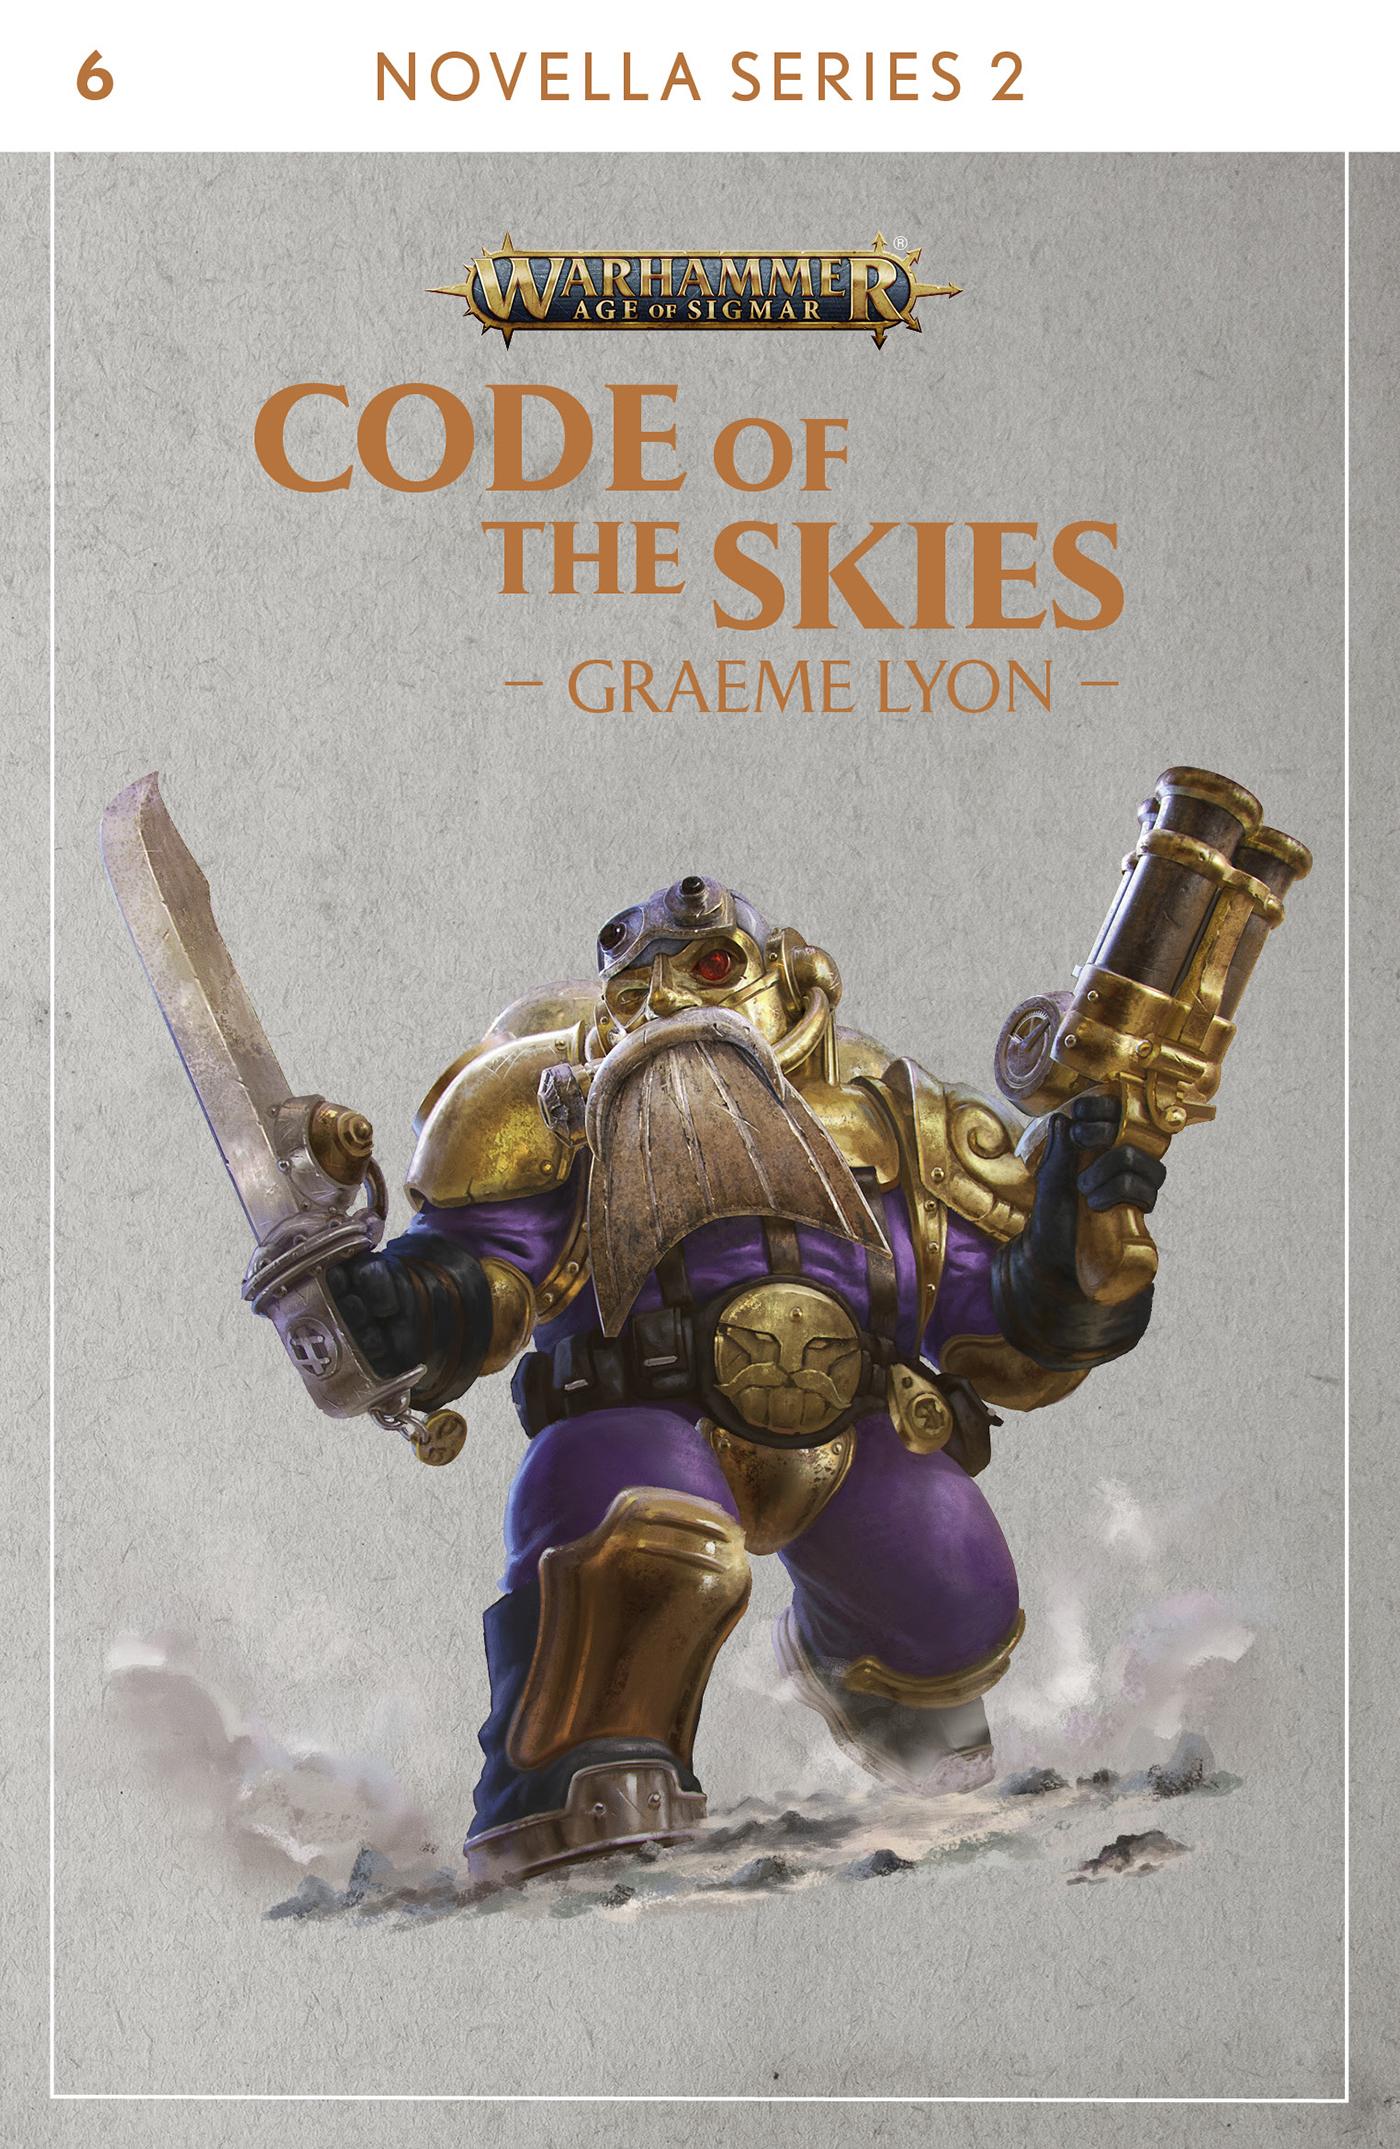 Code of the Skies by Graeme Lyon